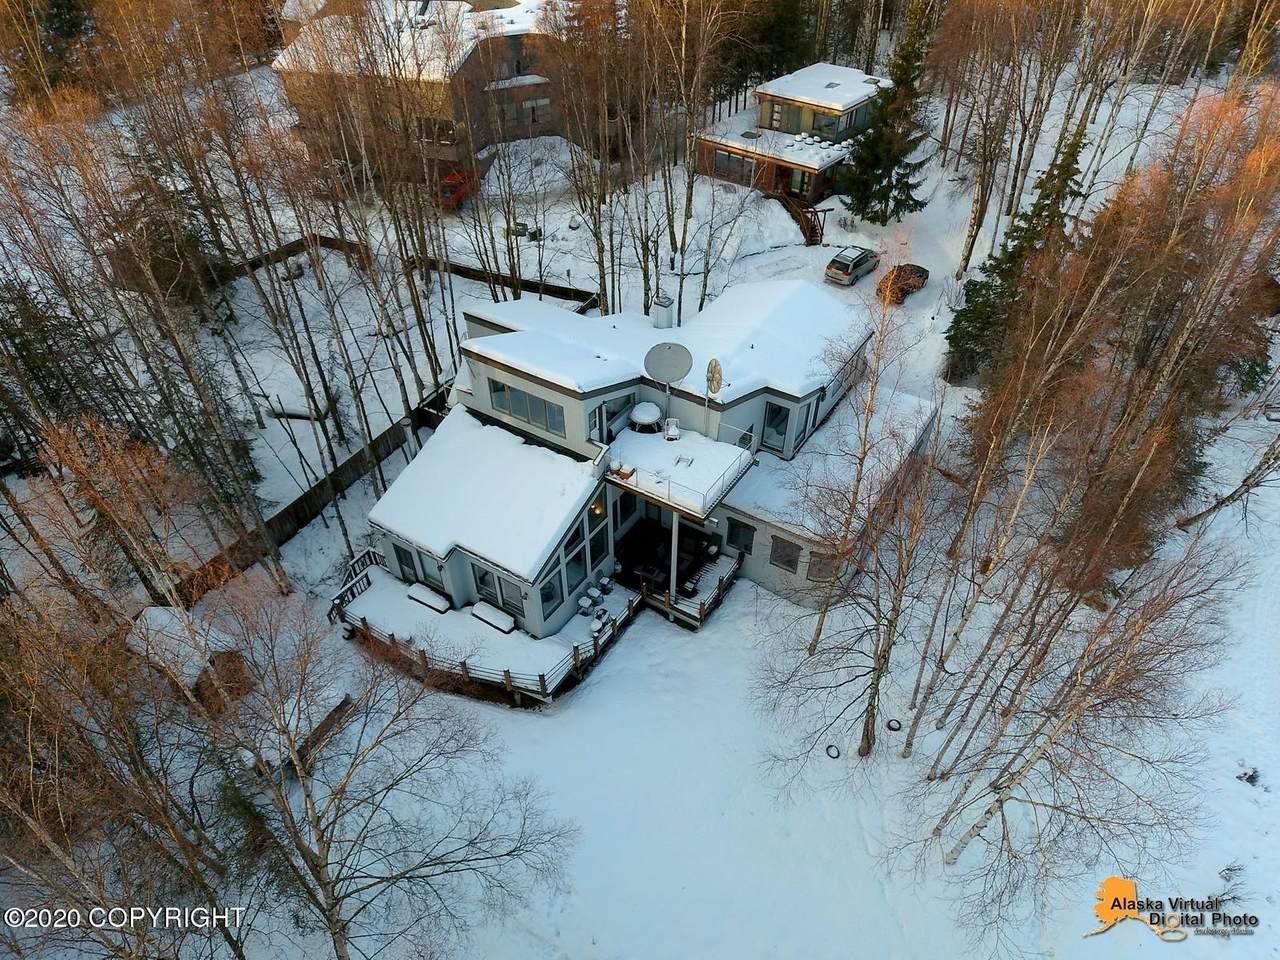 https://bt-photos.global.ssl.fastly.net/alaska/1280_boomver_1_20-16856-2.jpg